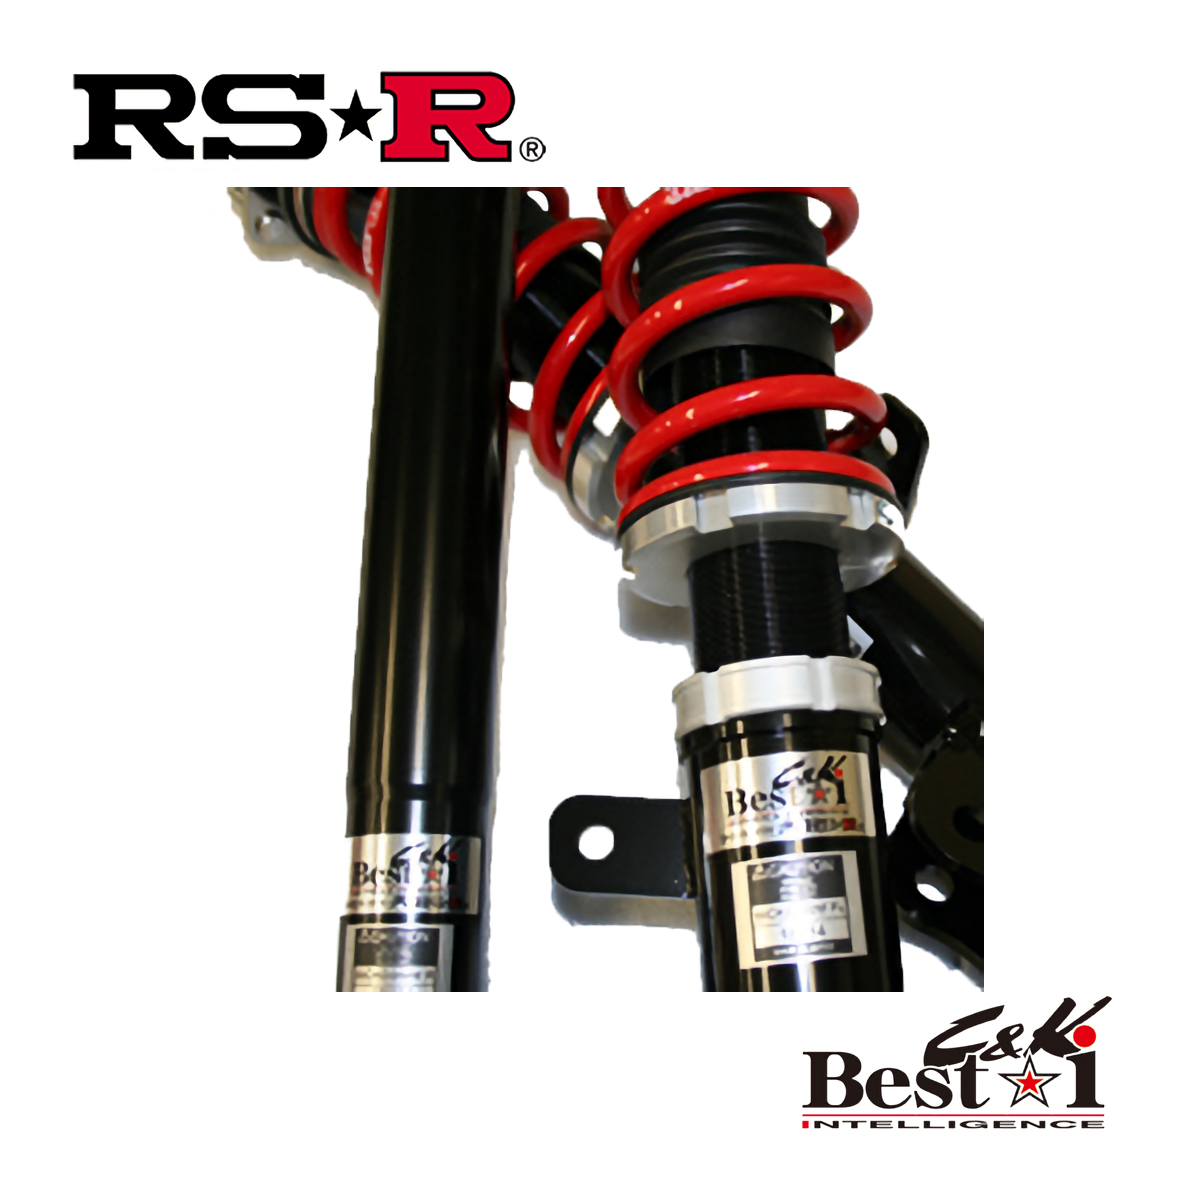 RS-R エブリィ エブリイ エブリー ワゴン DA17W PZターボ(ハイルーフ) 車高調 リア車高調整: ネジ式 BICKS650M ベストi C&K RSR 個人宅発送追金有